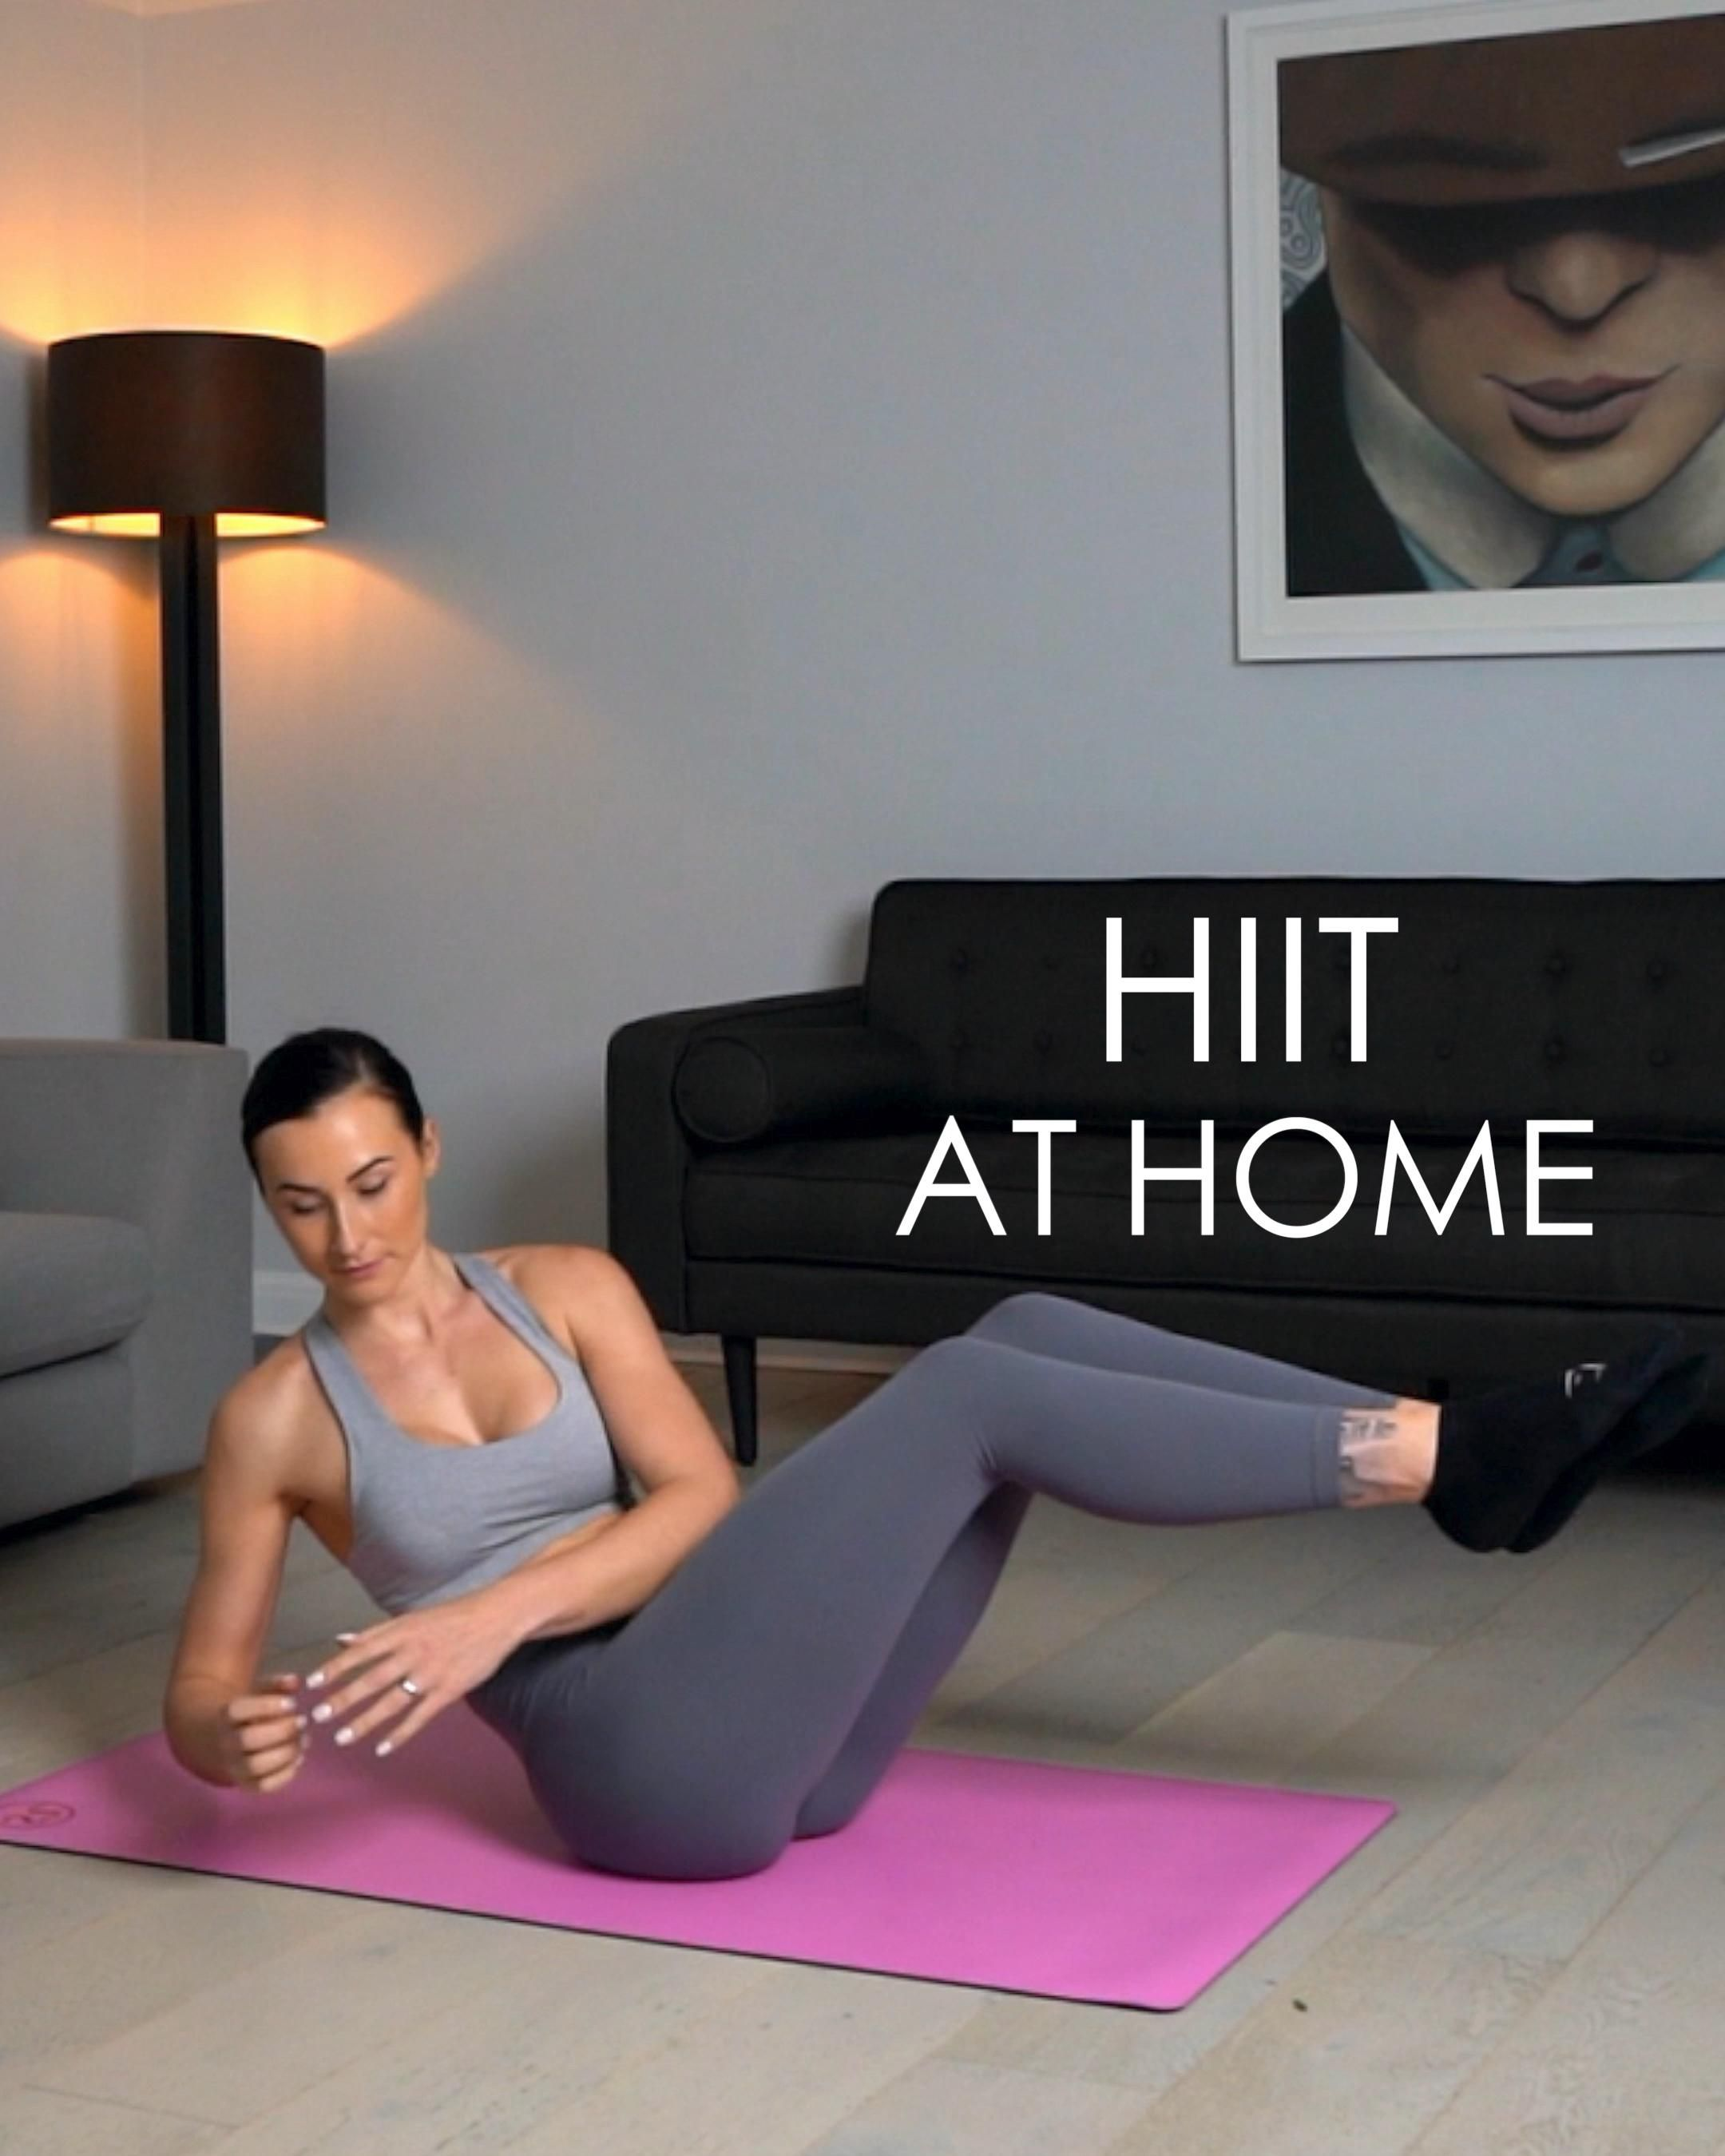 HIIT at home